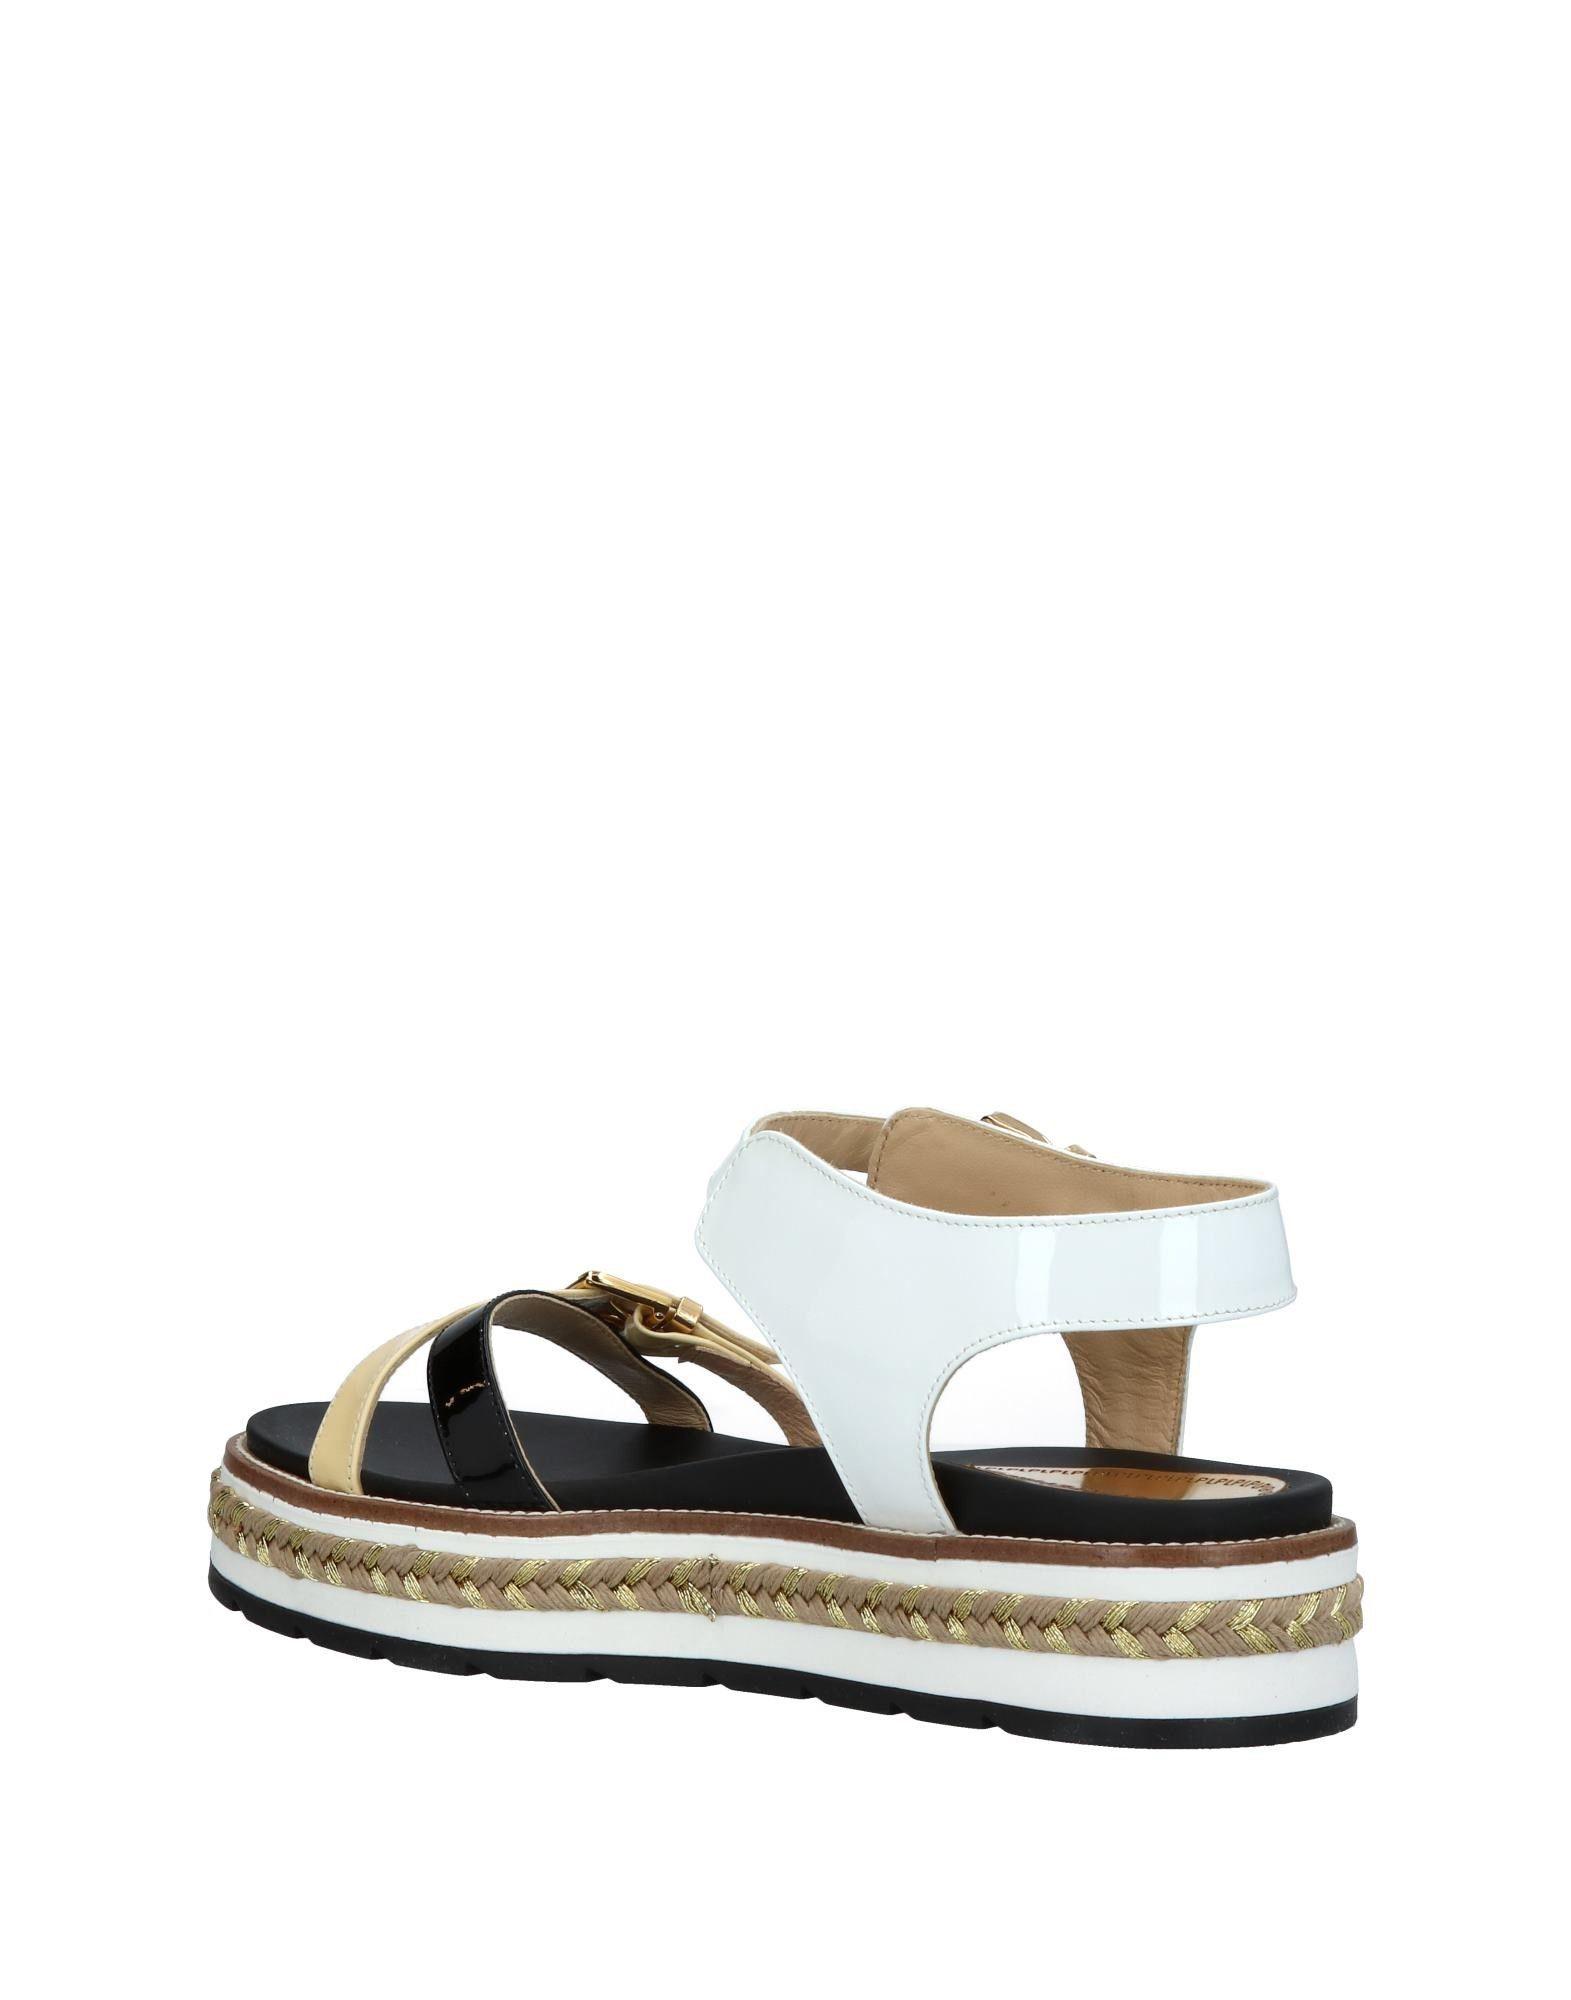 Loretta Pettinari Sandalen Damen  11386440WA Gute Qualität beliebte Schuhe